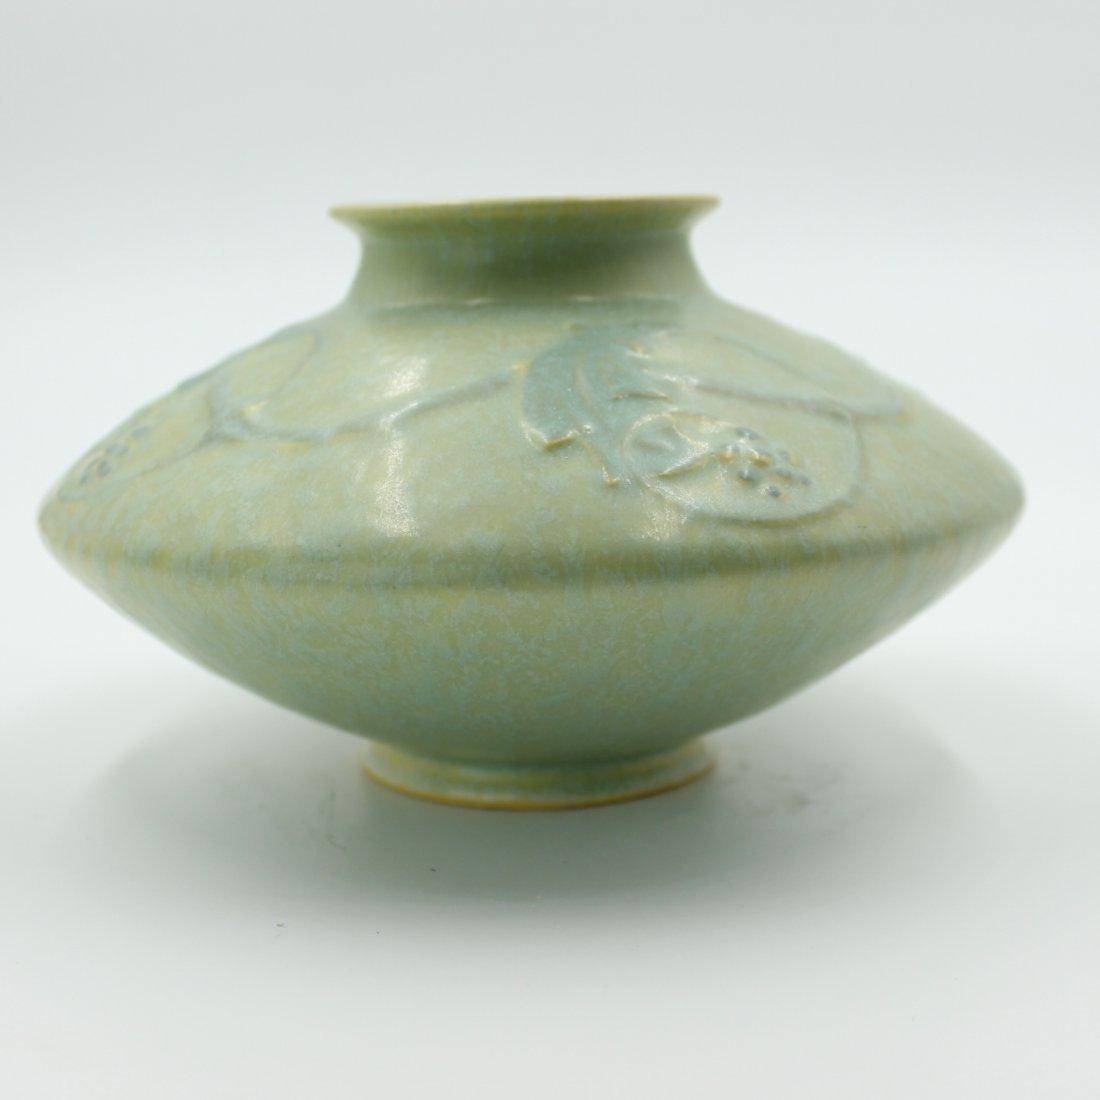 C. 1927 Roseville Cremona Vase #351-4 - 3